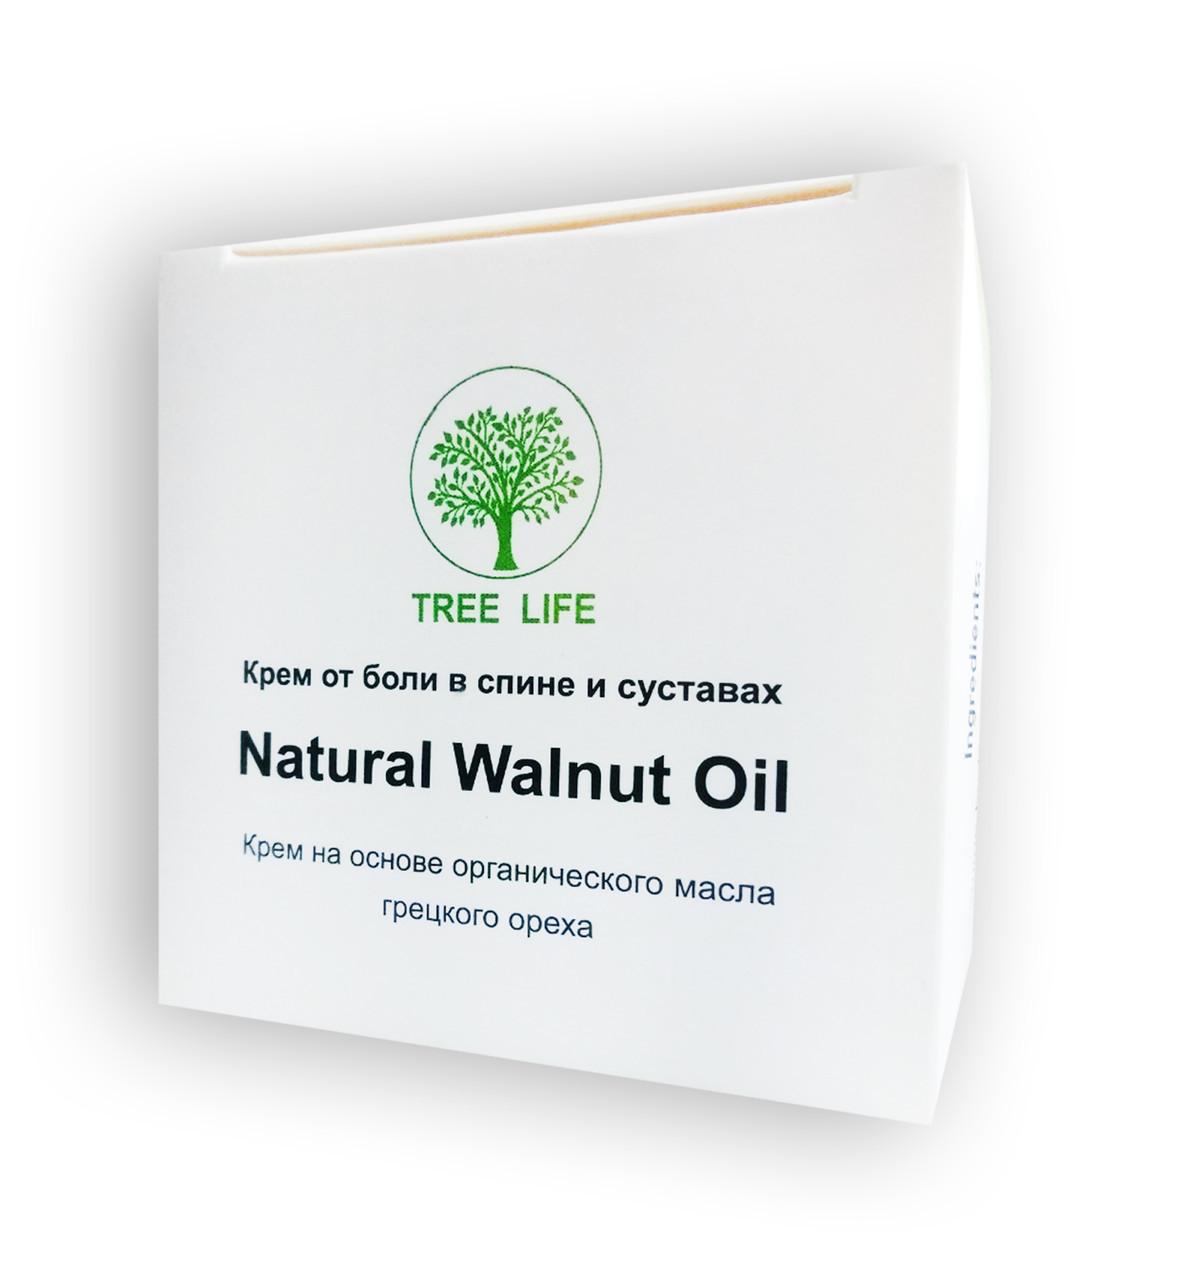 Natural Walnut Oil - Крем от боли в спине и суставах Нейчирал Велнут Ойл